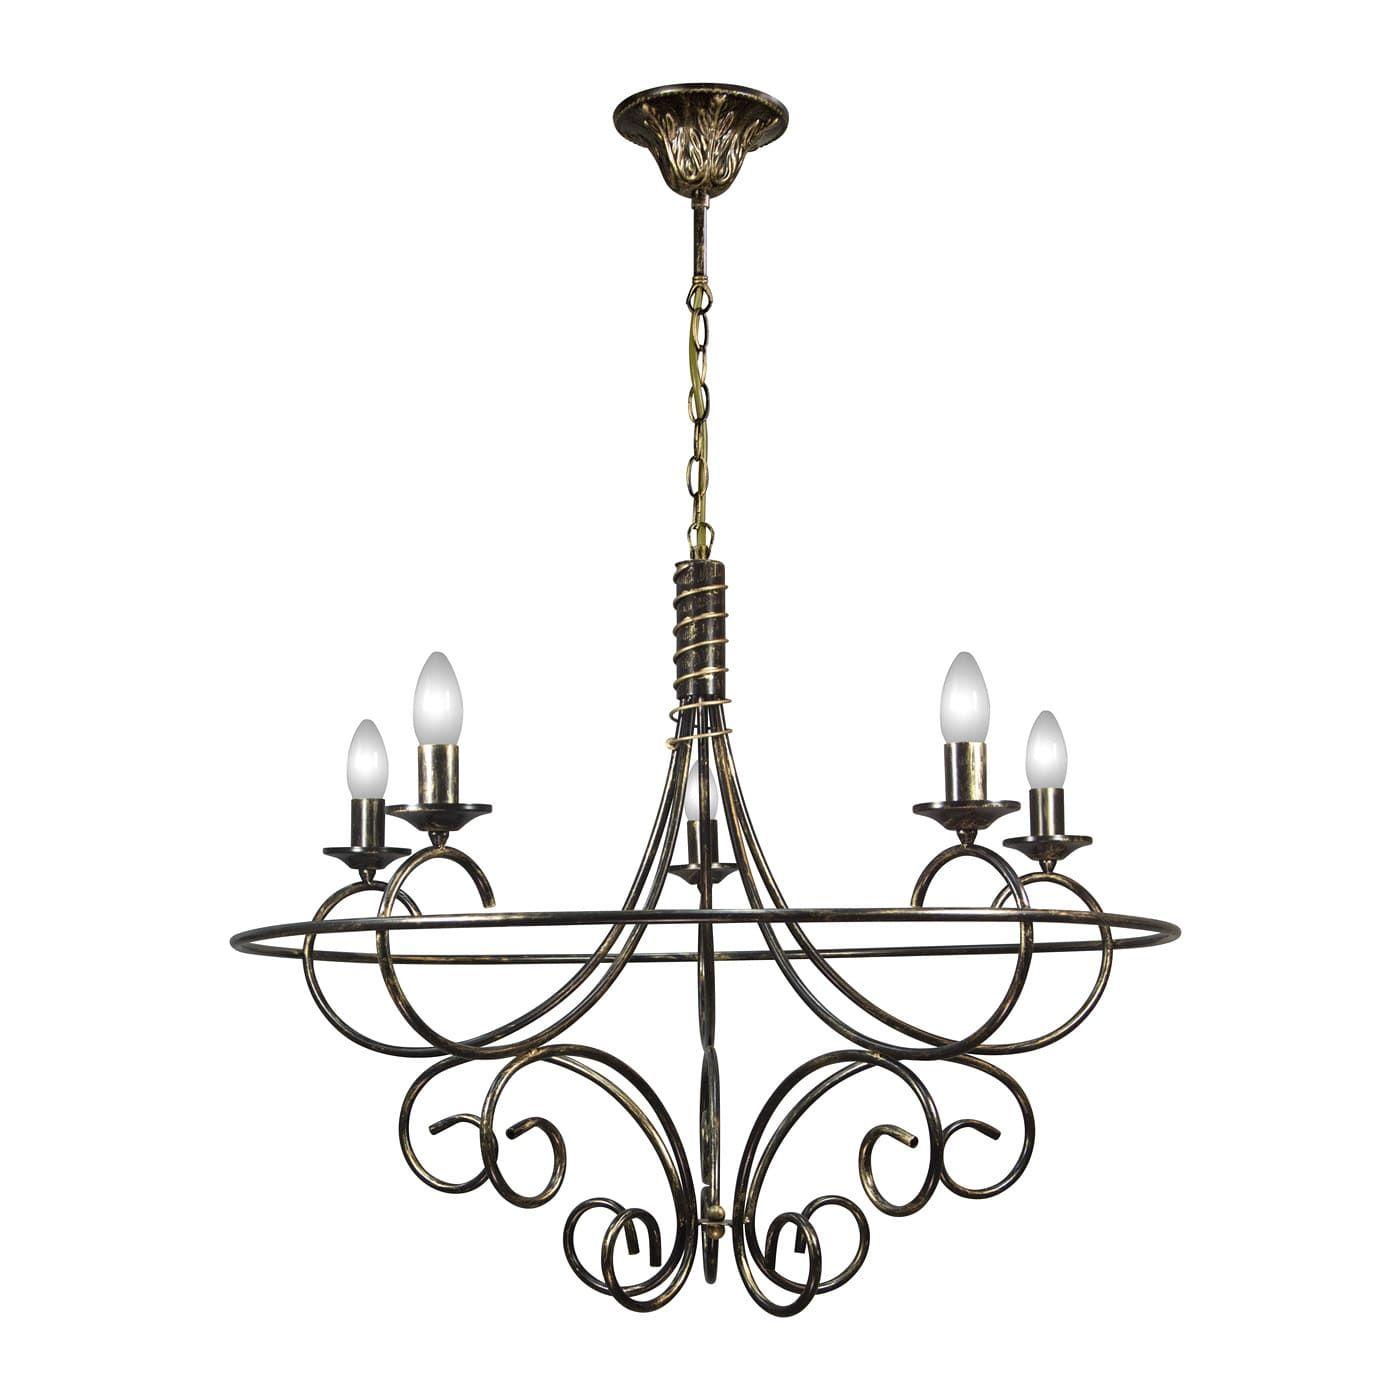 PETRASVET / Pendant chandelier S3127-5, 5xE14 max. 60W